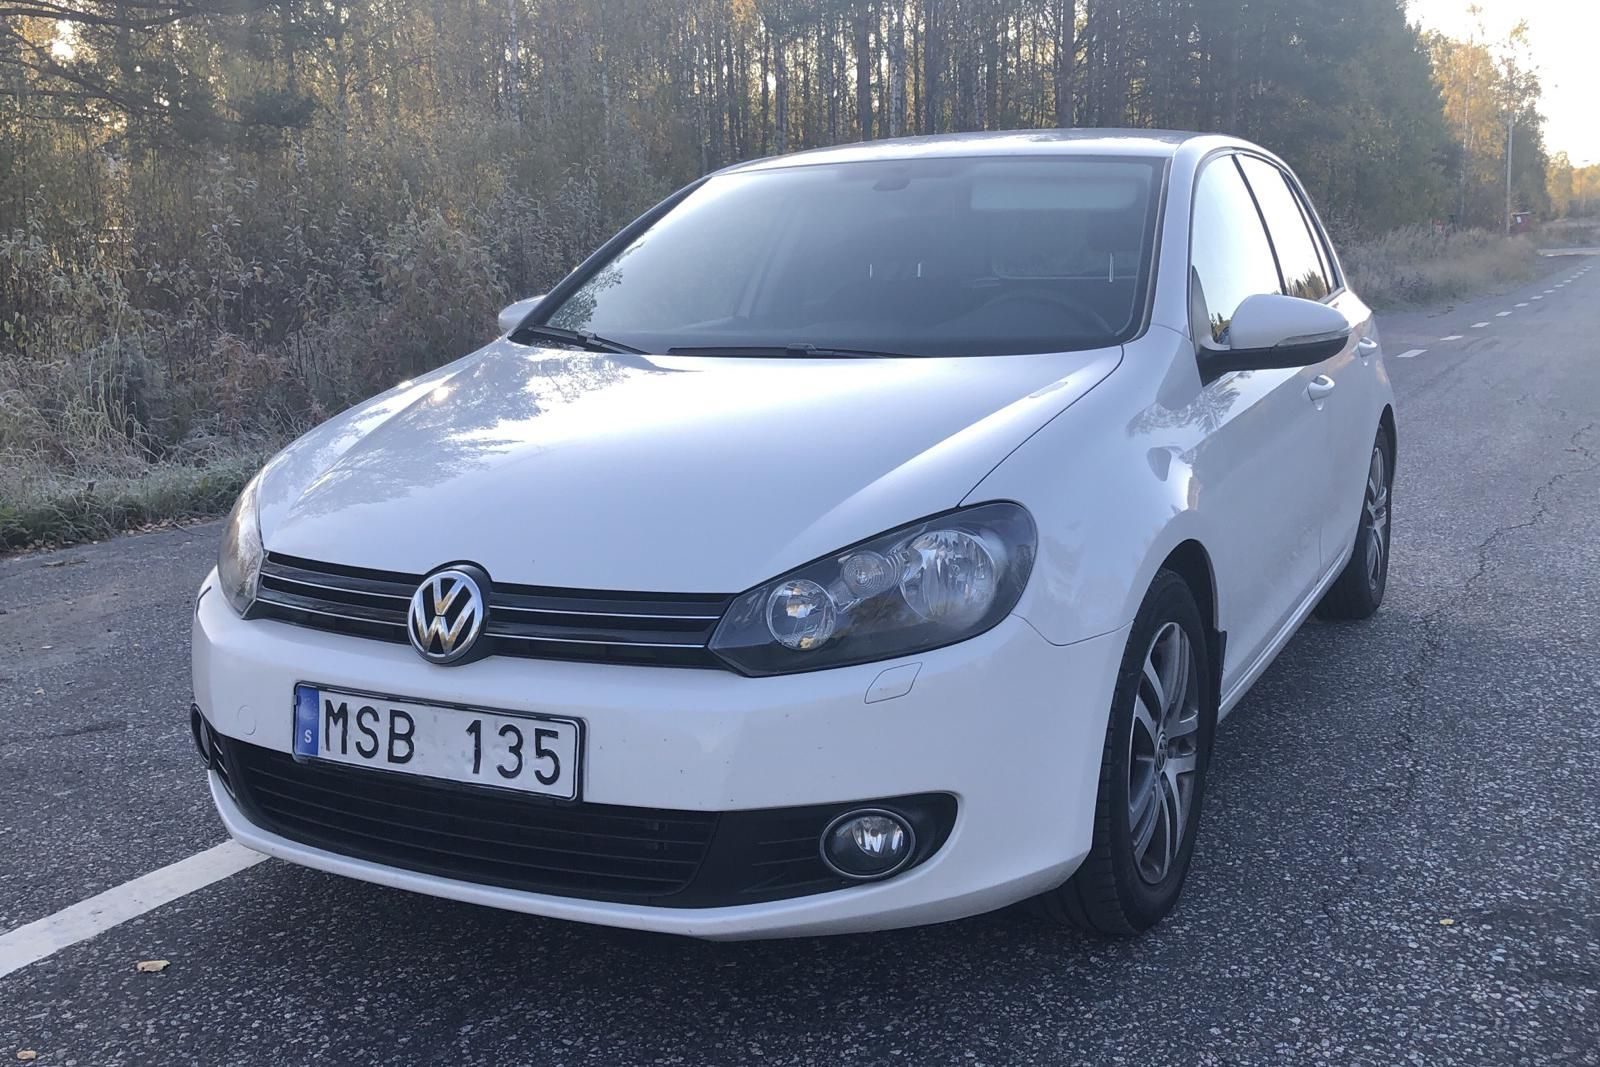 VW Golf VI 1.6 TDI BlueMotion tehnologija 5dr (105hk)